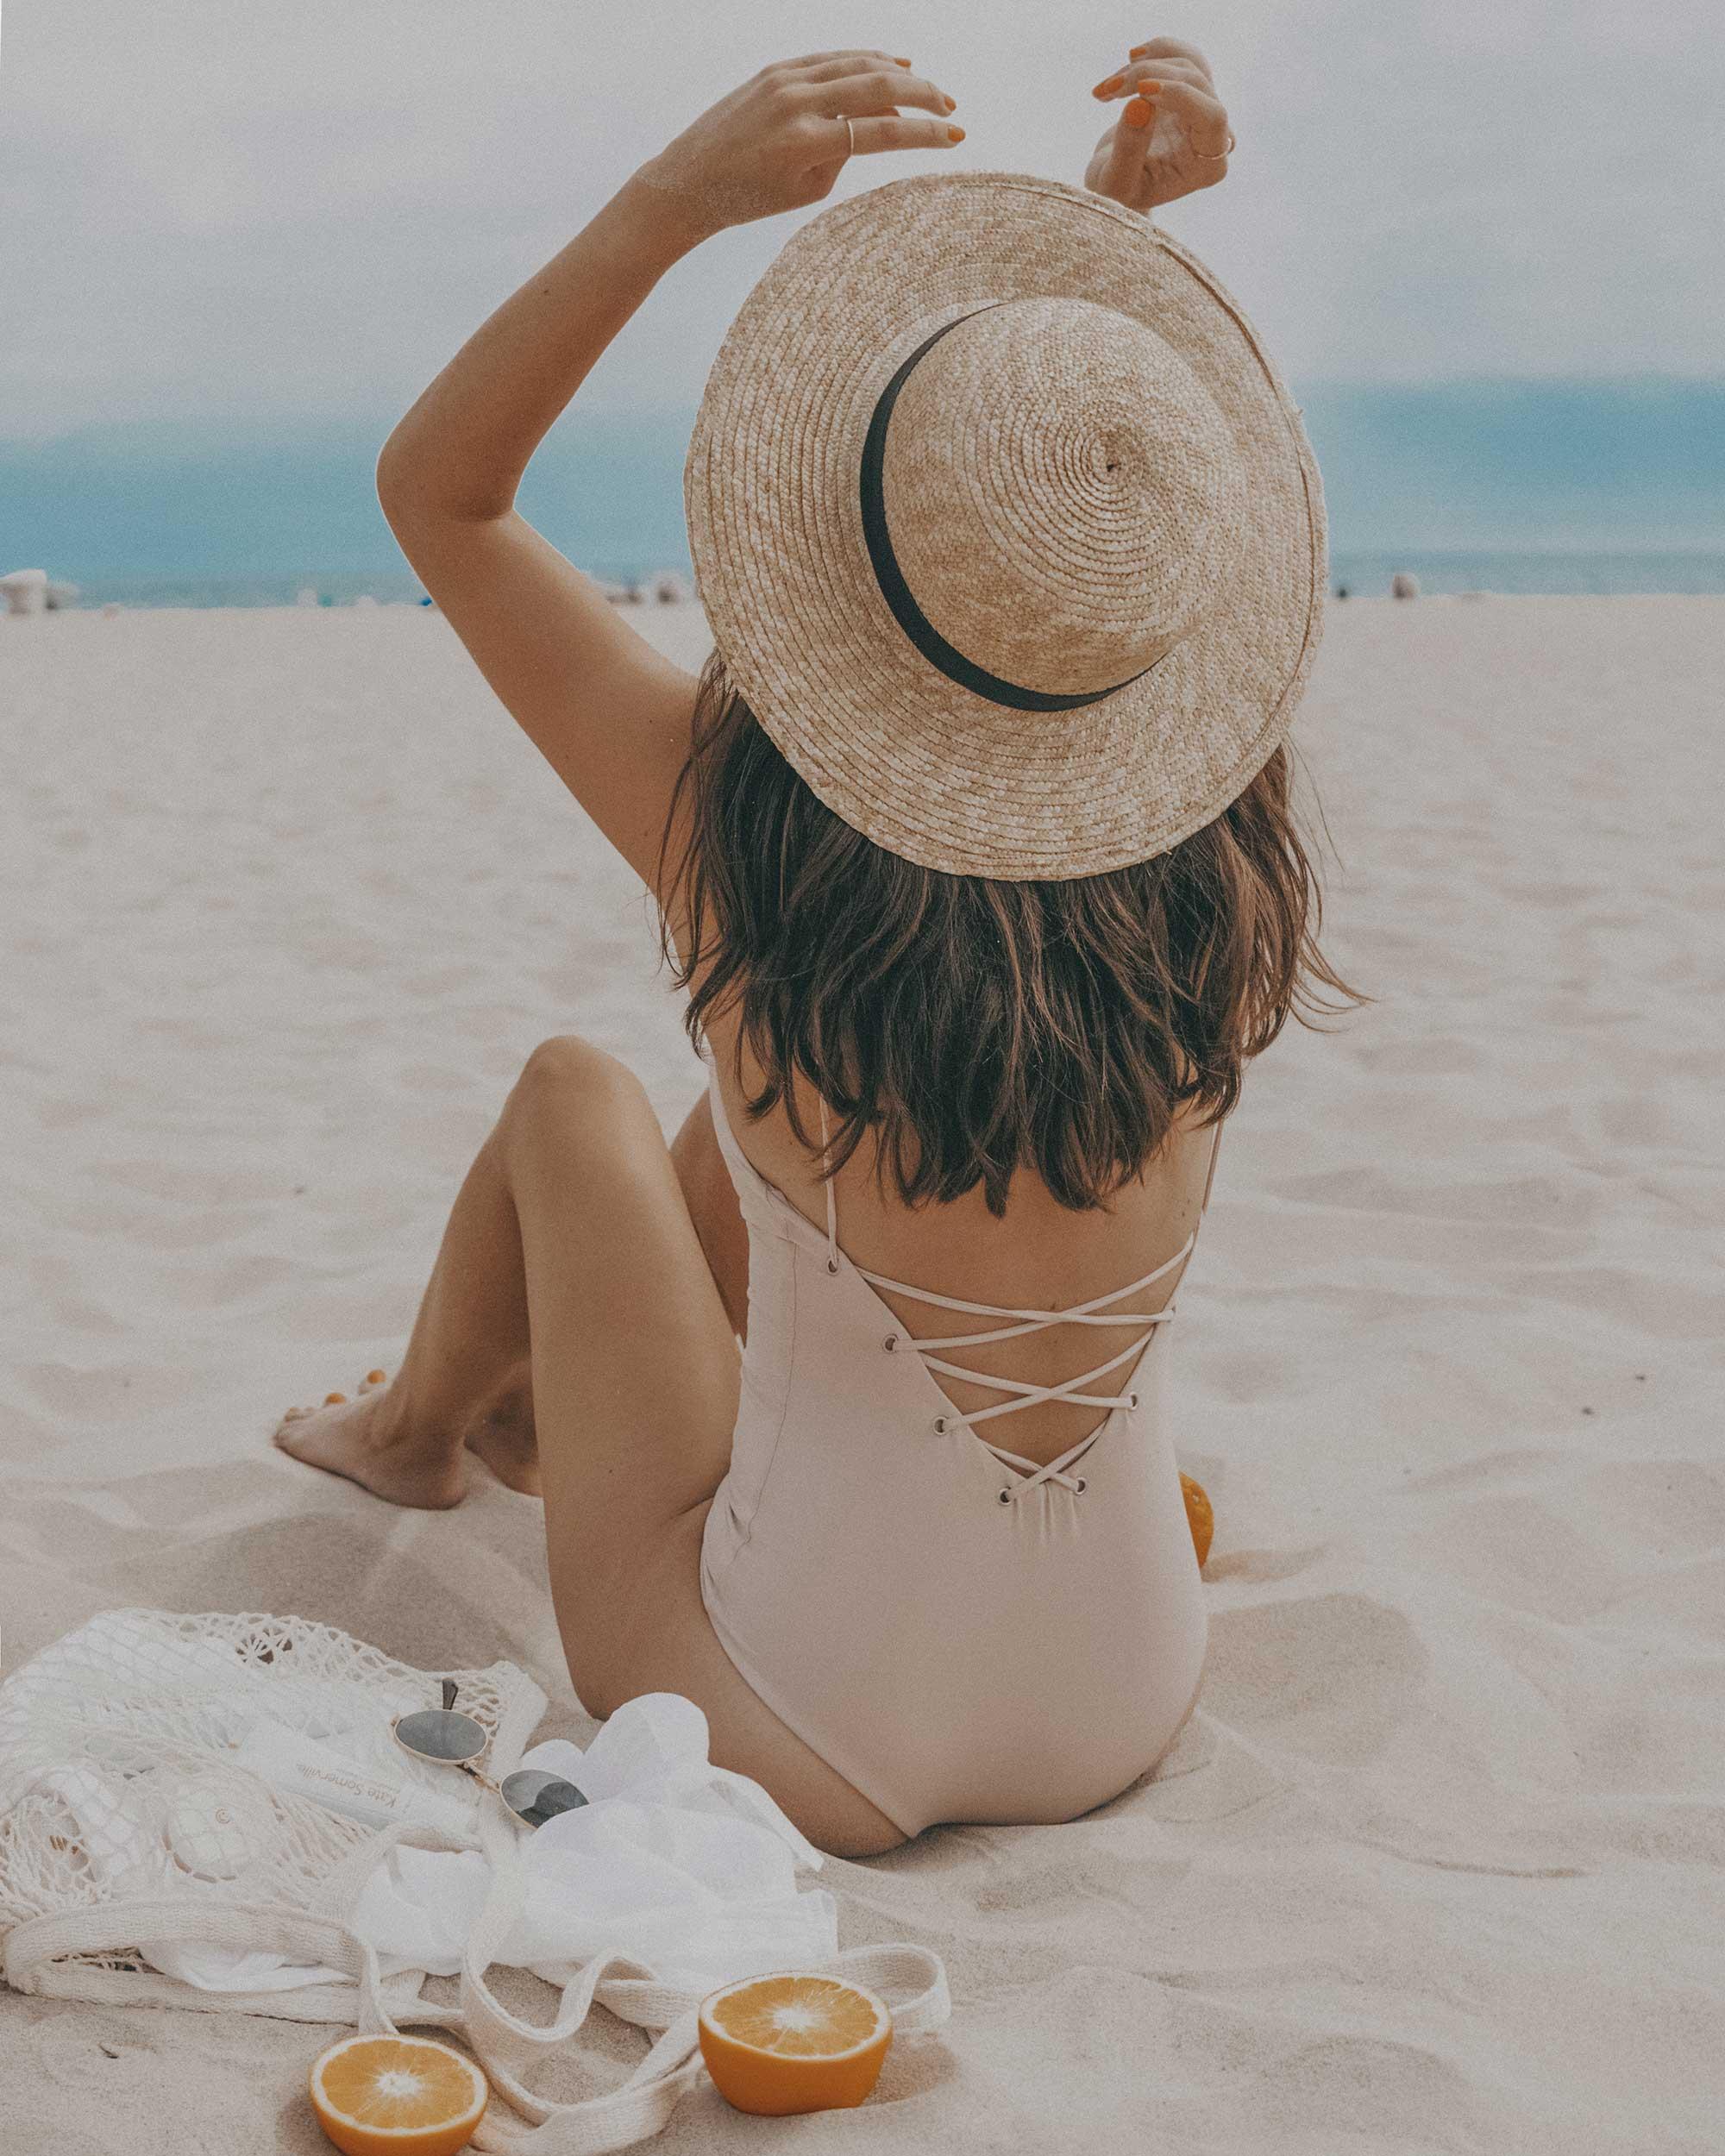 Tavik-swimwear-lace-up-front-one-piece-swimsuit-newport-beach-california-8.jpg